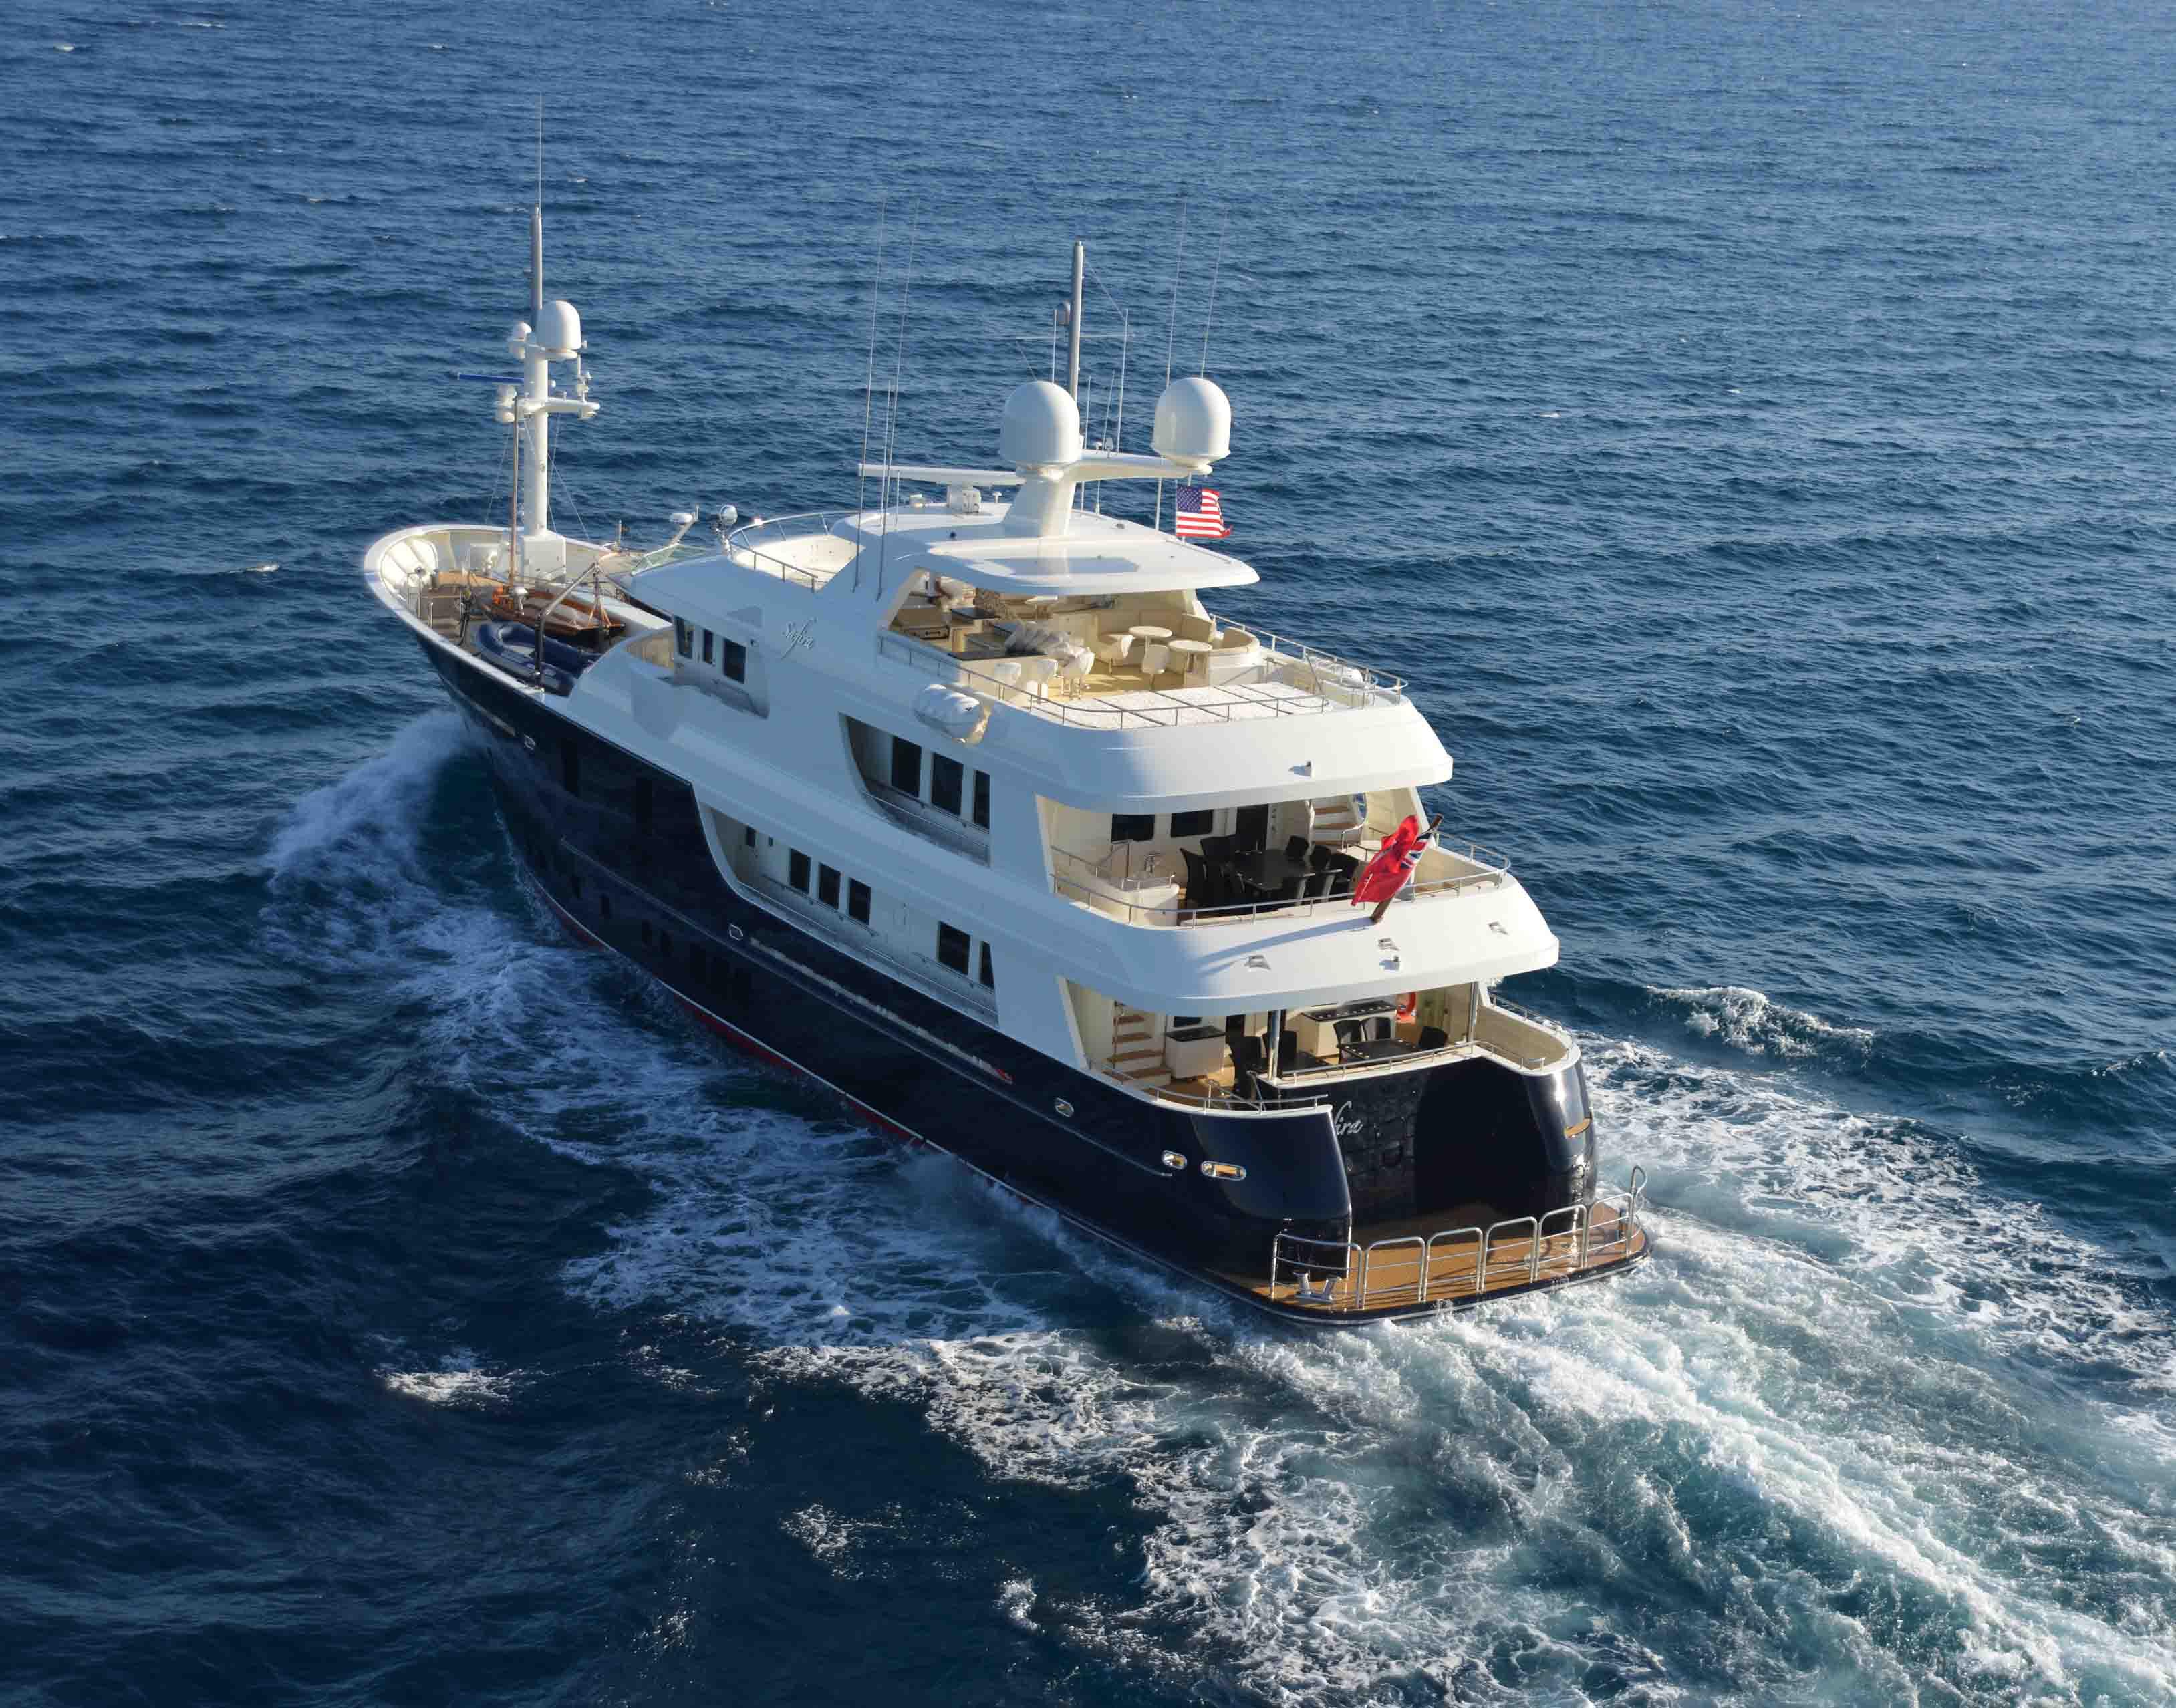 Motor Yacht SAFIRA A Newcastle Marine And Tyneside